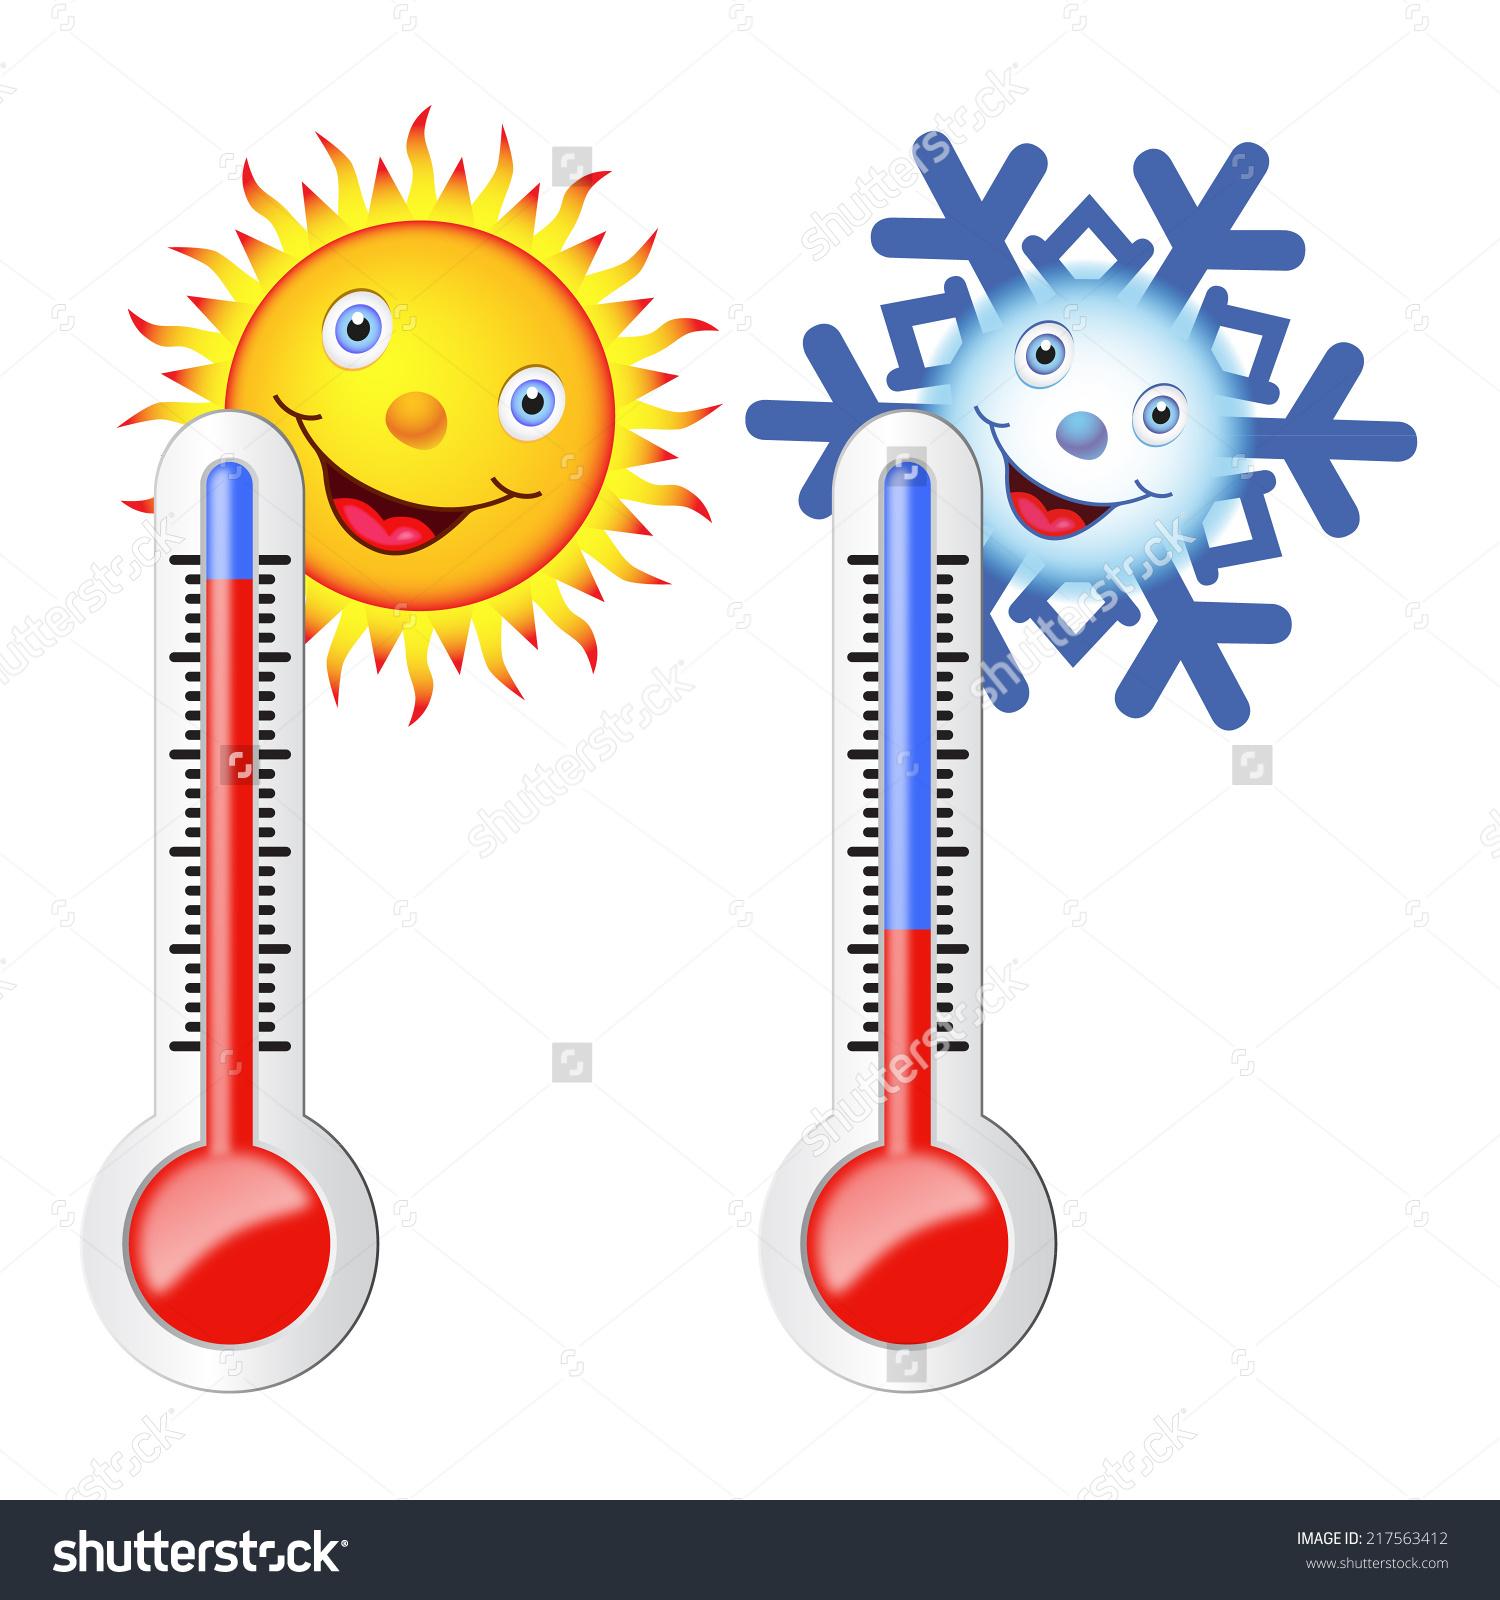 Cute Clipart Of Hot Temperatures